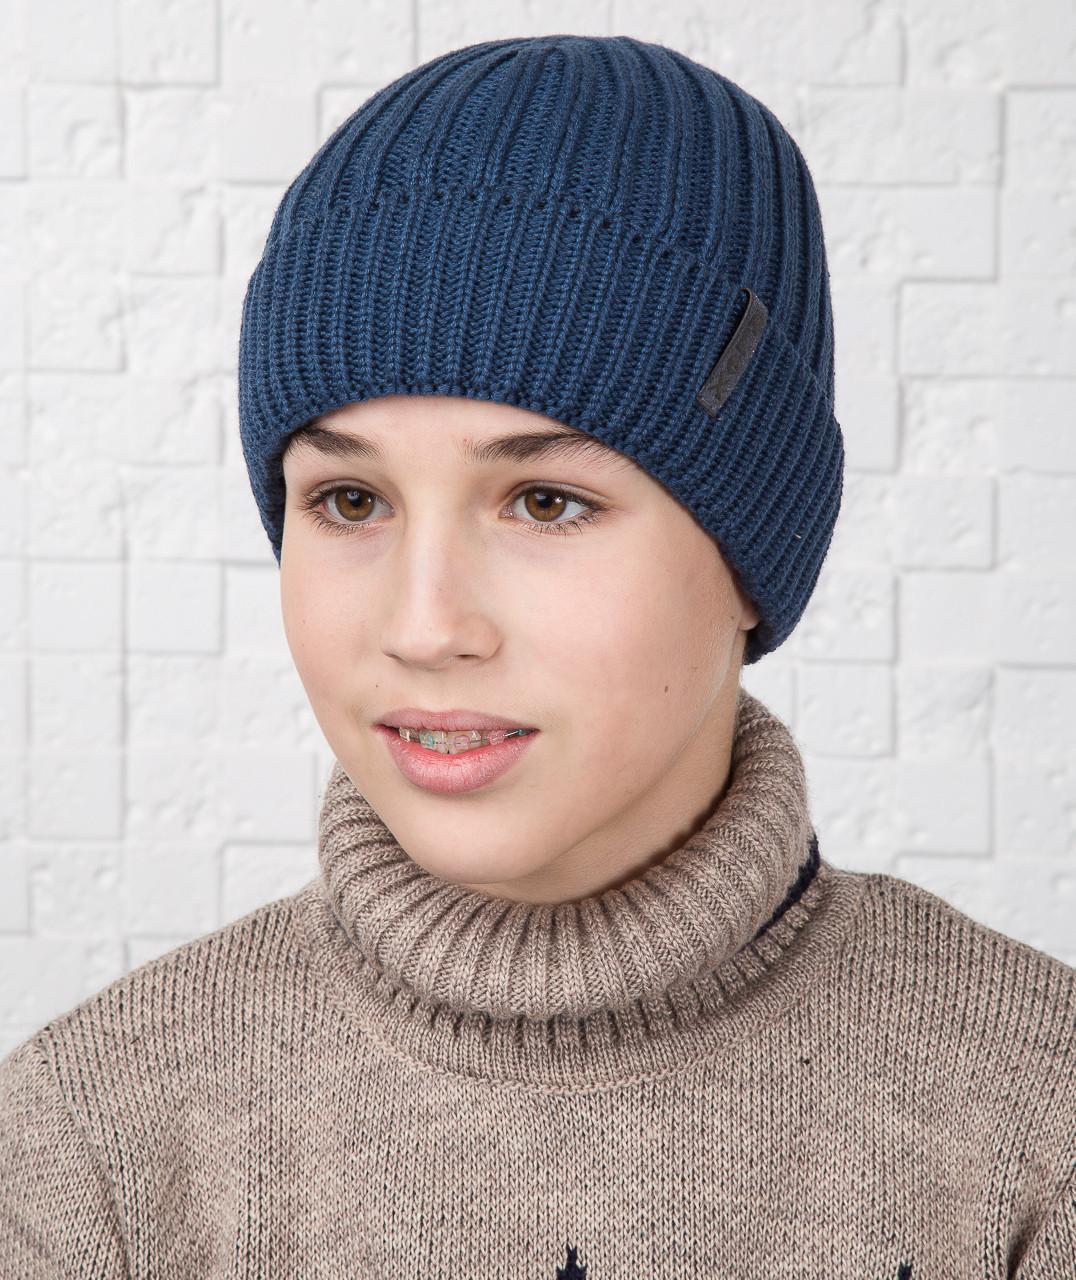 Зимняя шапка для мальчика подростка на флисе - Артикул AL17022